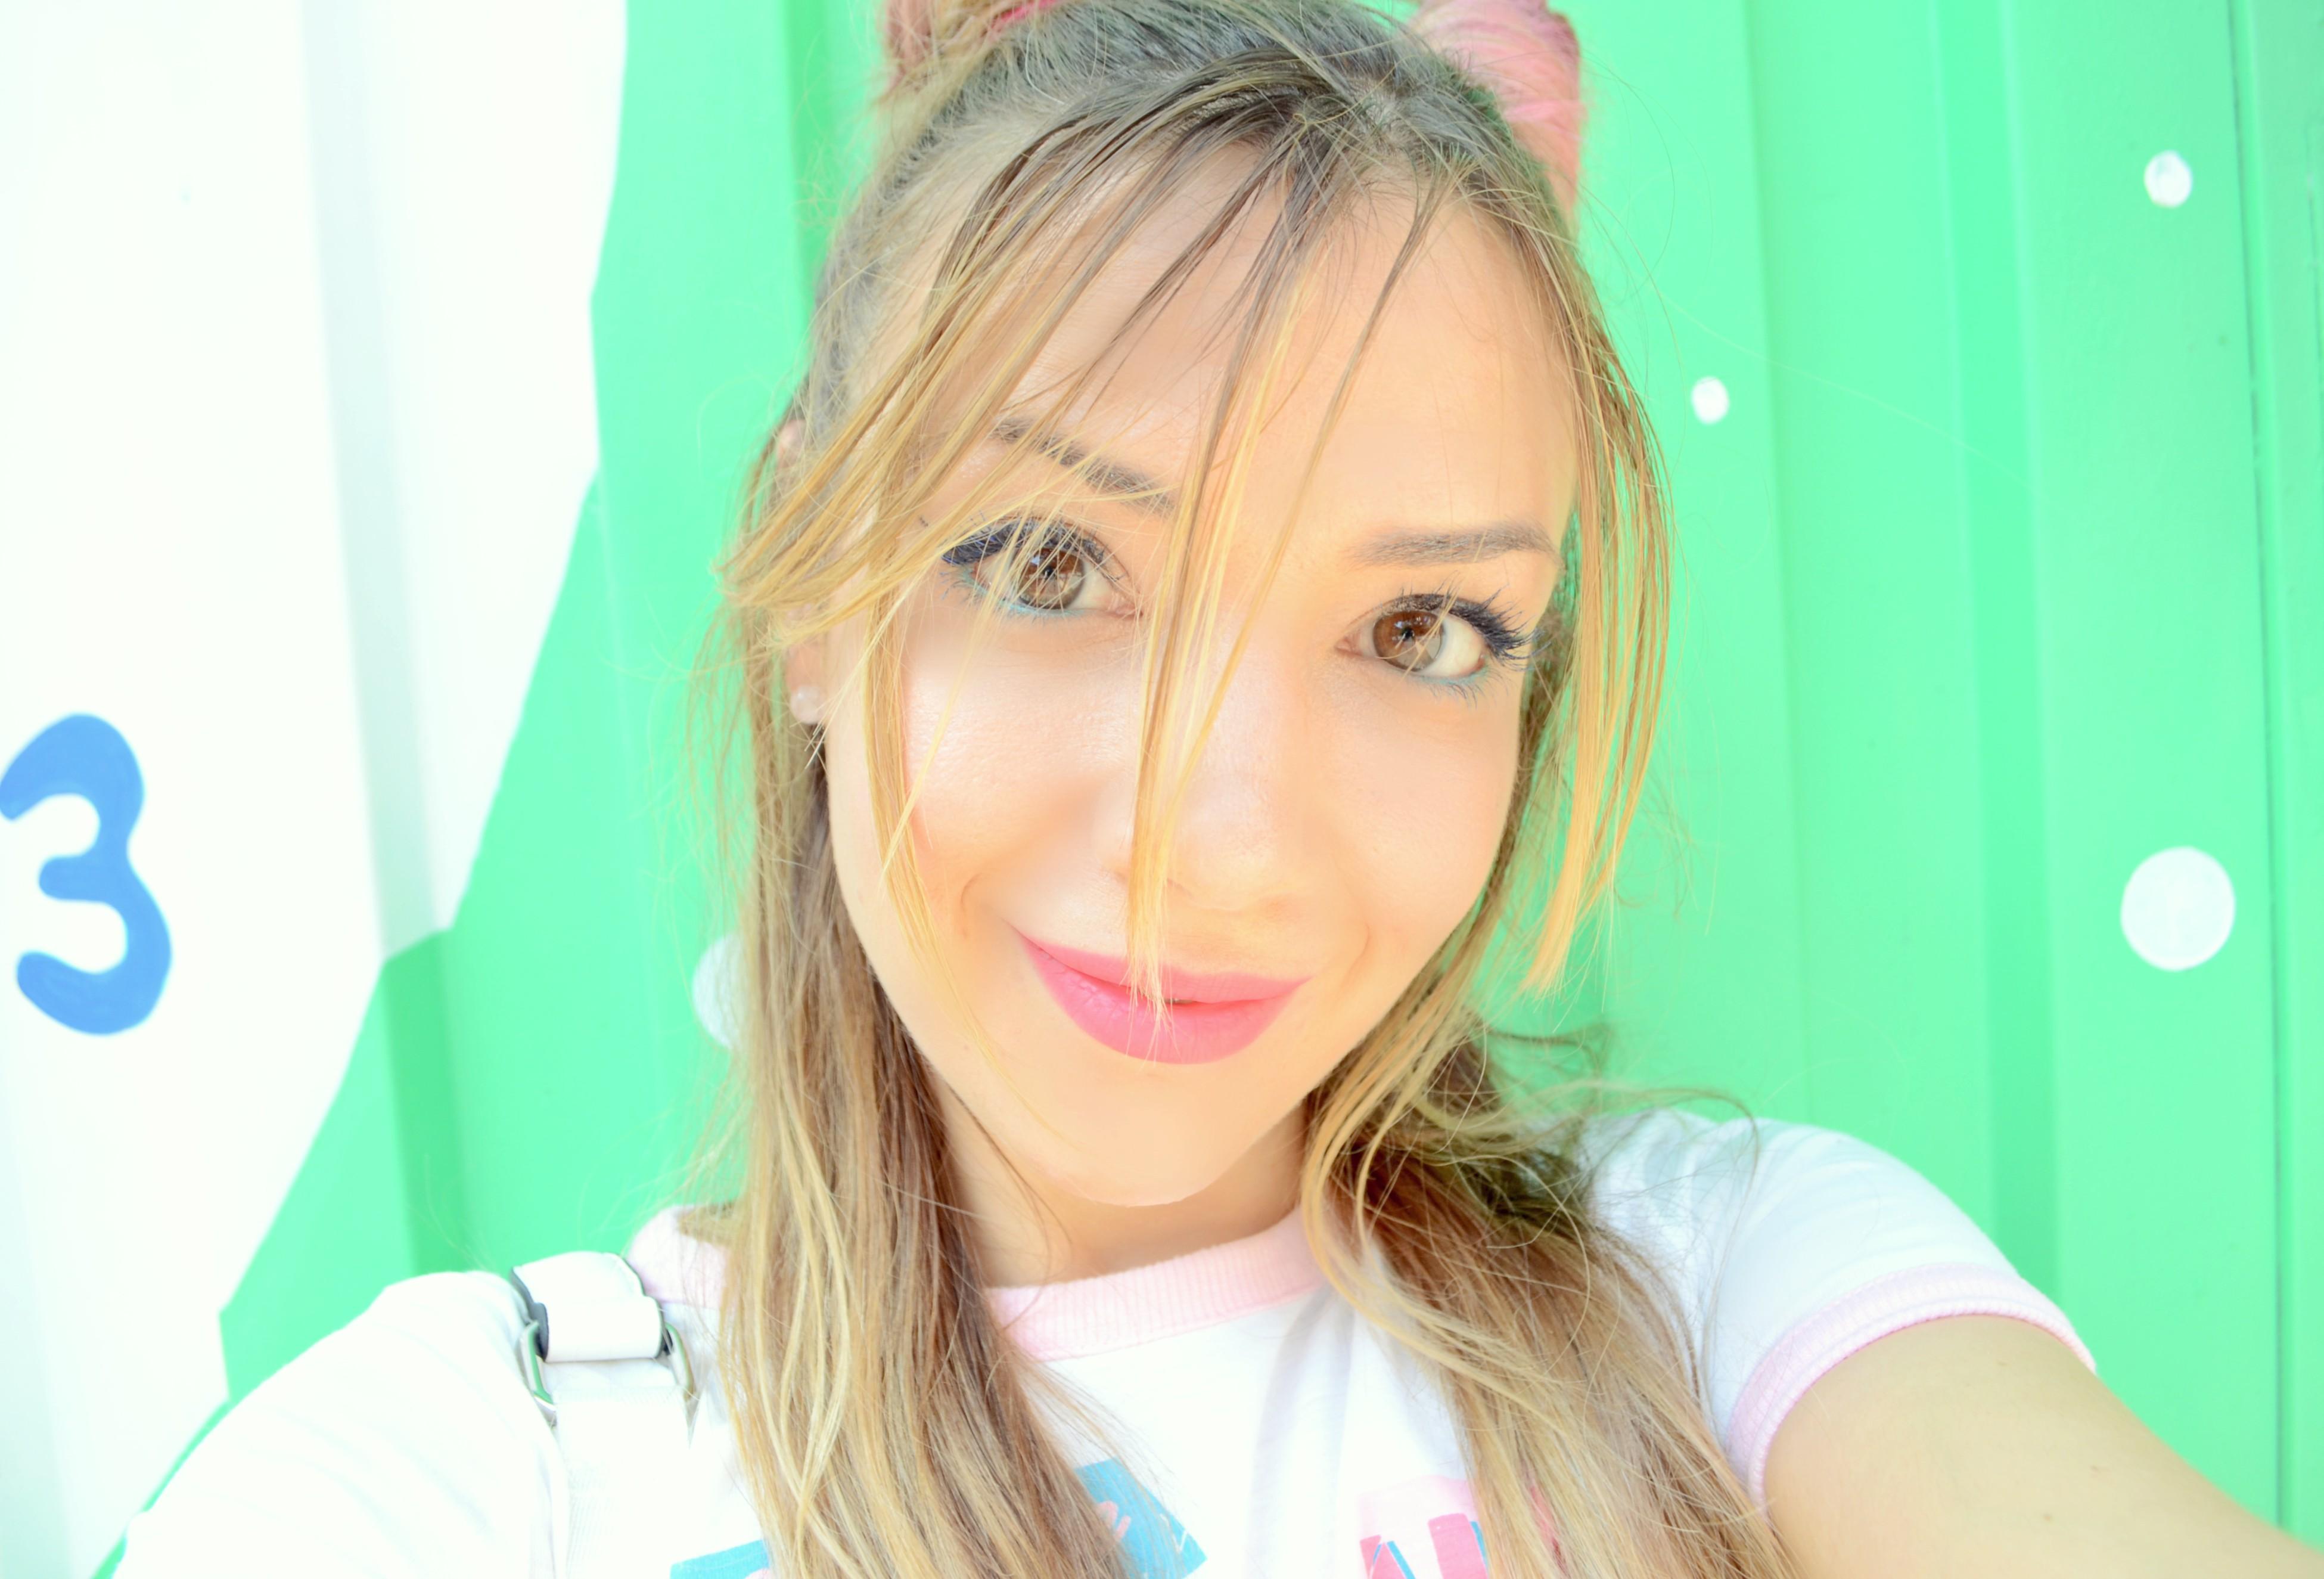 Beauty-blogger-fashionista-90s-look-ChicAdicta-influencer-espana-Chic-Adicta-pelo-rosa-colorista-loreal-maquillaje-de-verano-PiensaenChic-Piensa-en-Chic